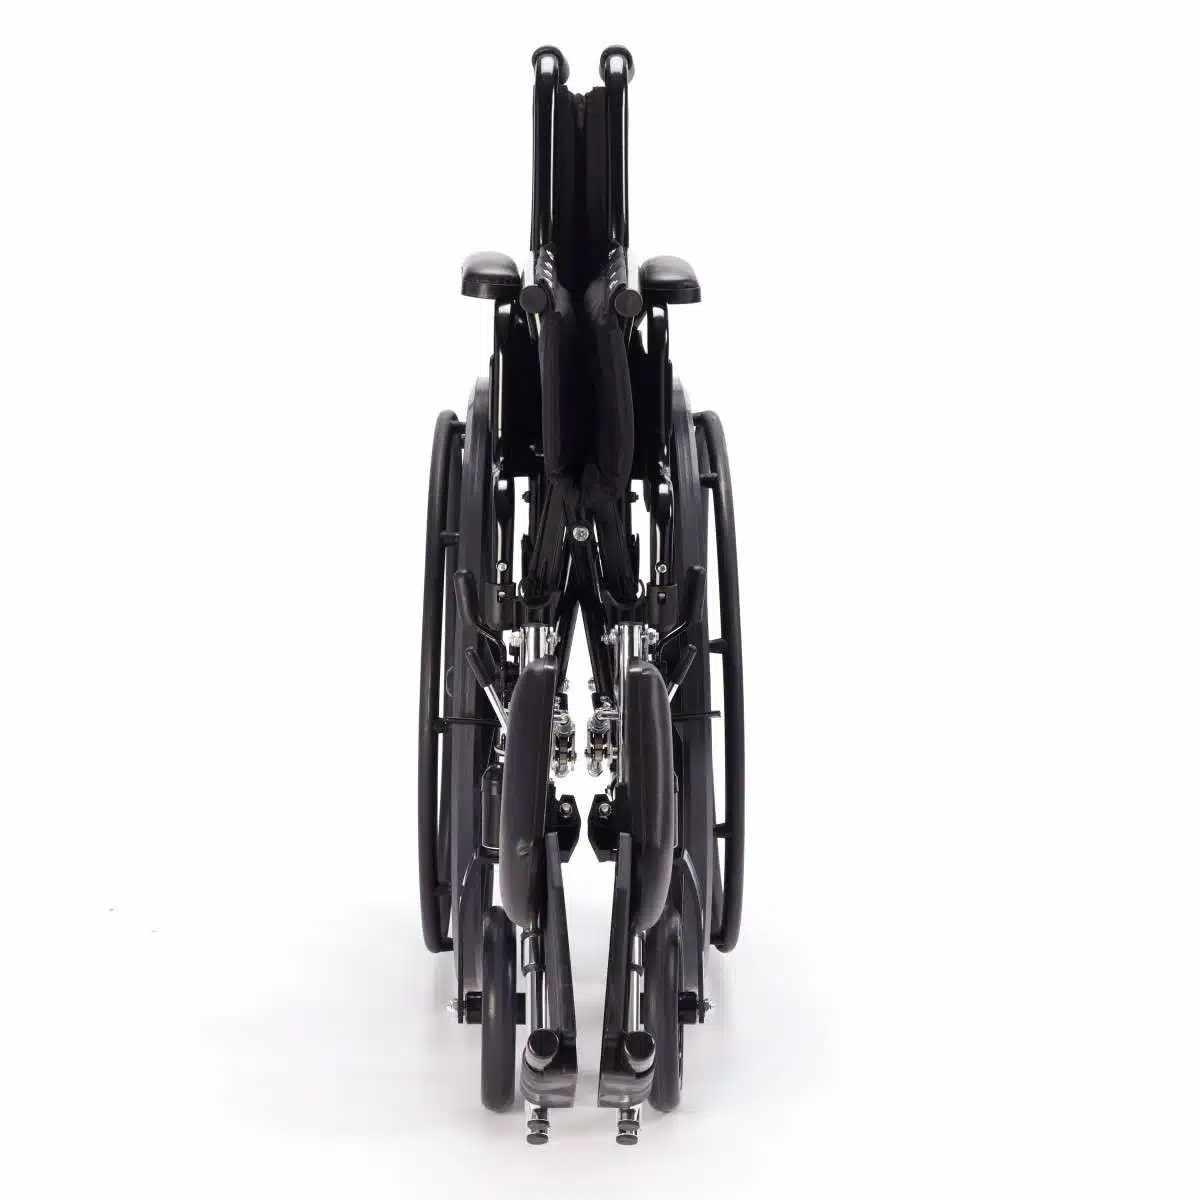 Invacare Ivc 9000 Sl Wheelchair | Invacare Wheelchair